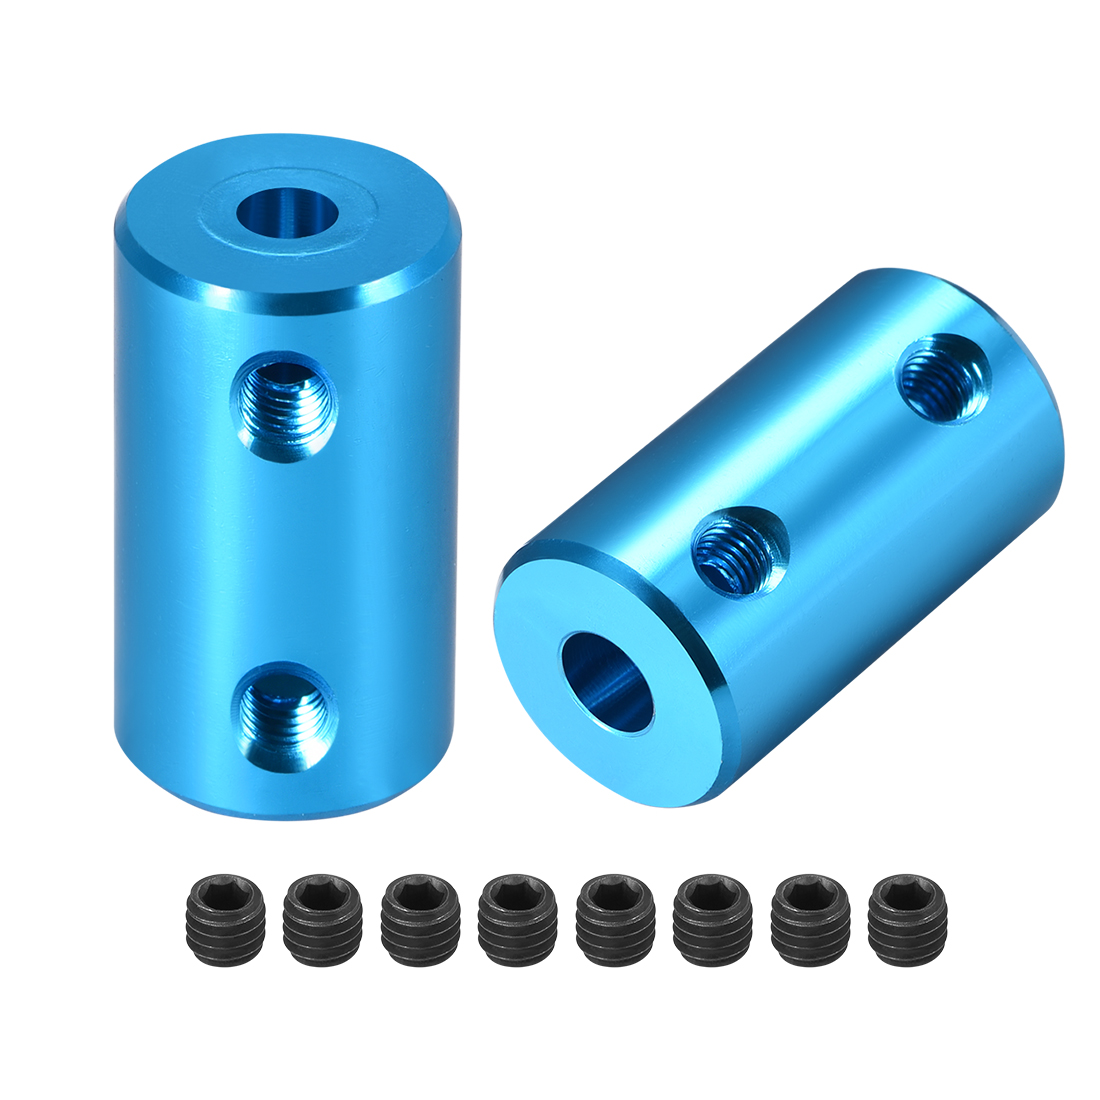 Shaft Coupling 4mm to 5mm Bore L25xD14 Robot Motor Wheel Rigid Coupler Blue 2Pcs